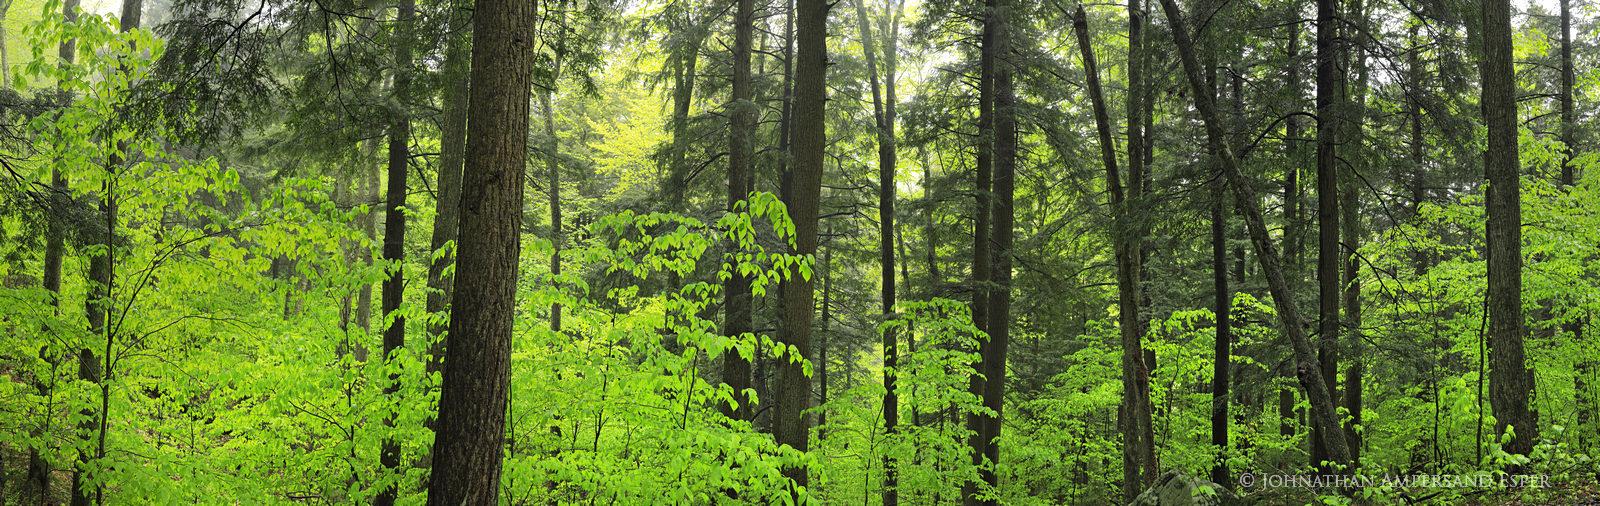 Tenent Creek,Hope Falls,rainy,wet,spring,panorama,forest,pine,rainy forest,pine forest,spring forest,Johnathan Esper,Adirondack...